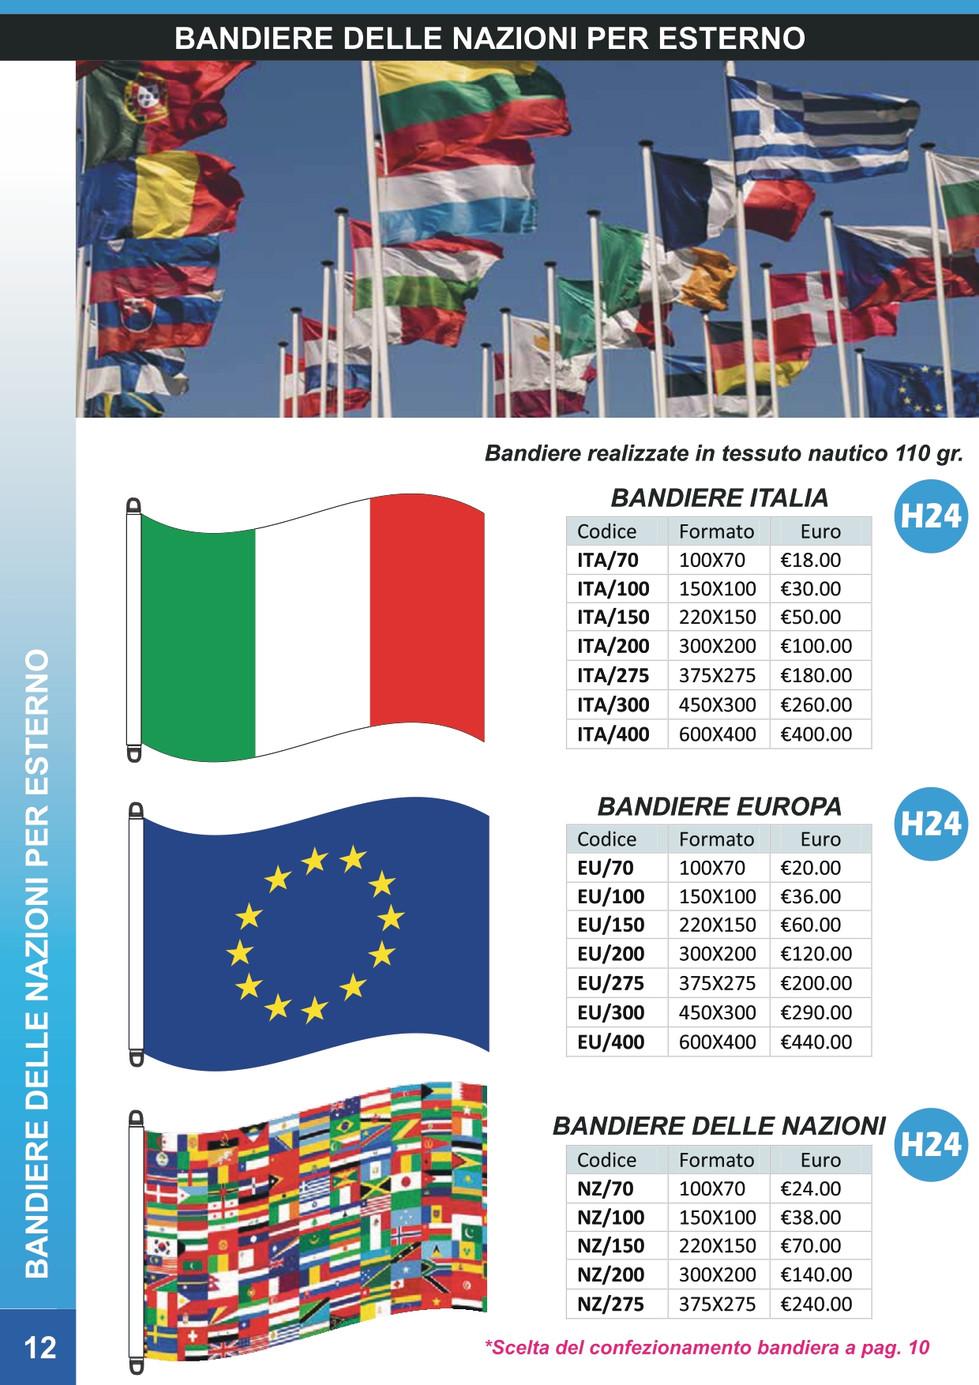 flagBandiere_page-0014.jpg